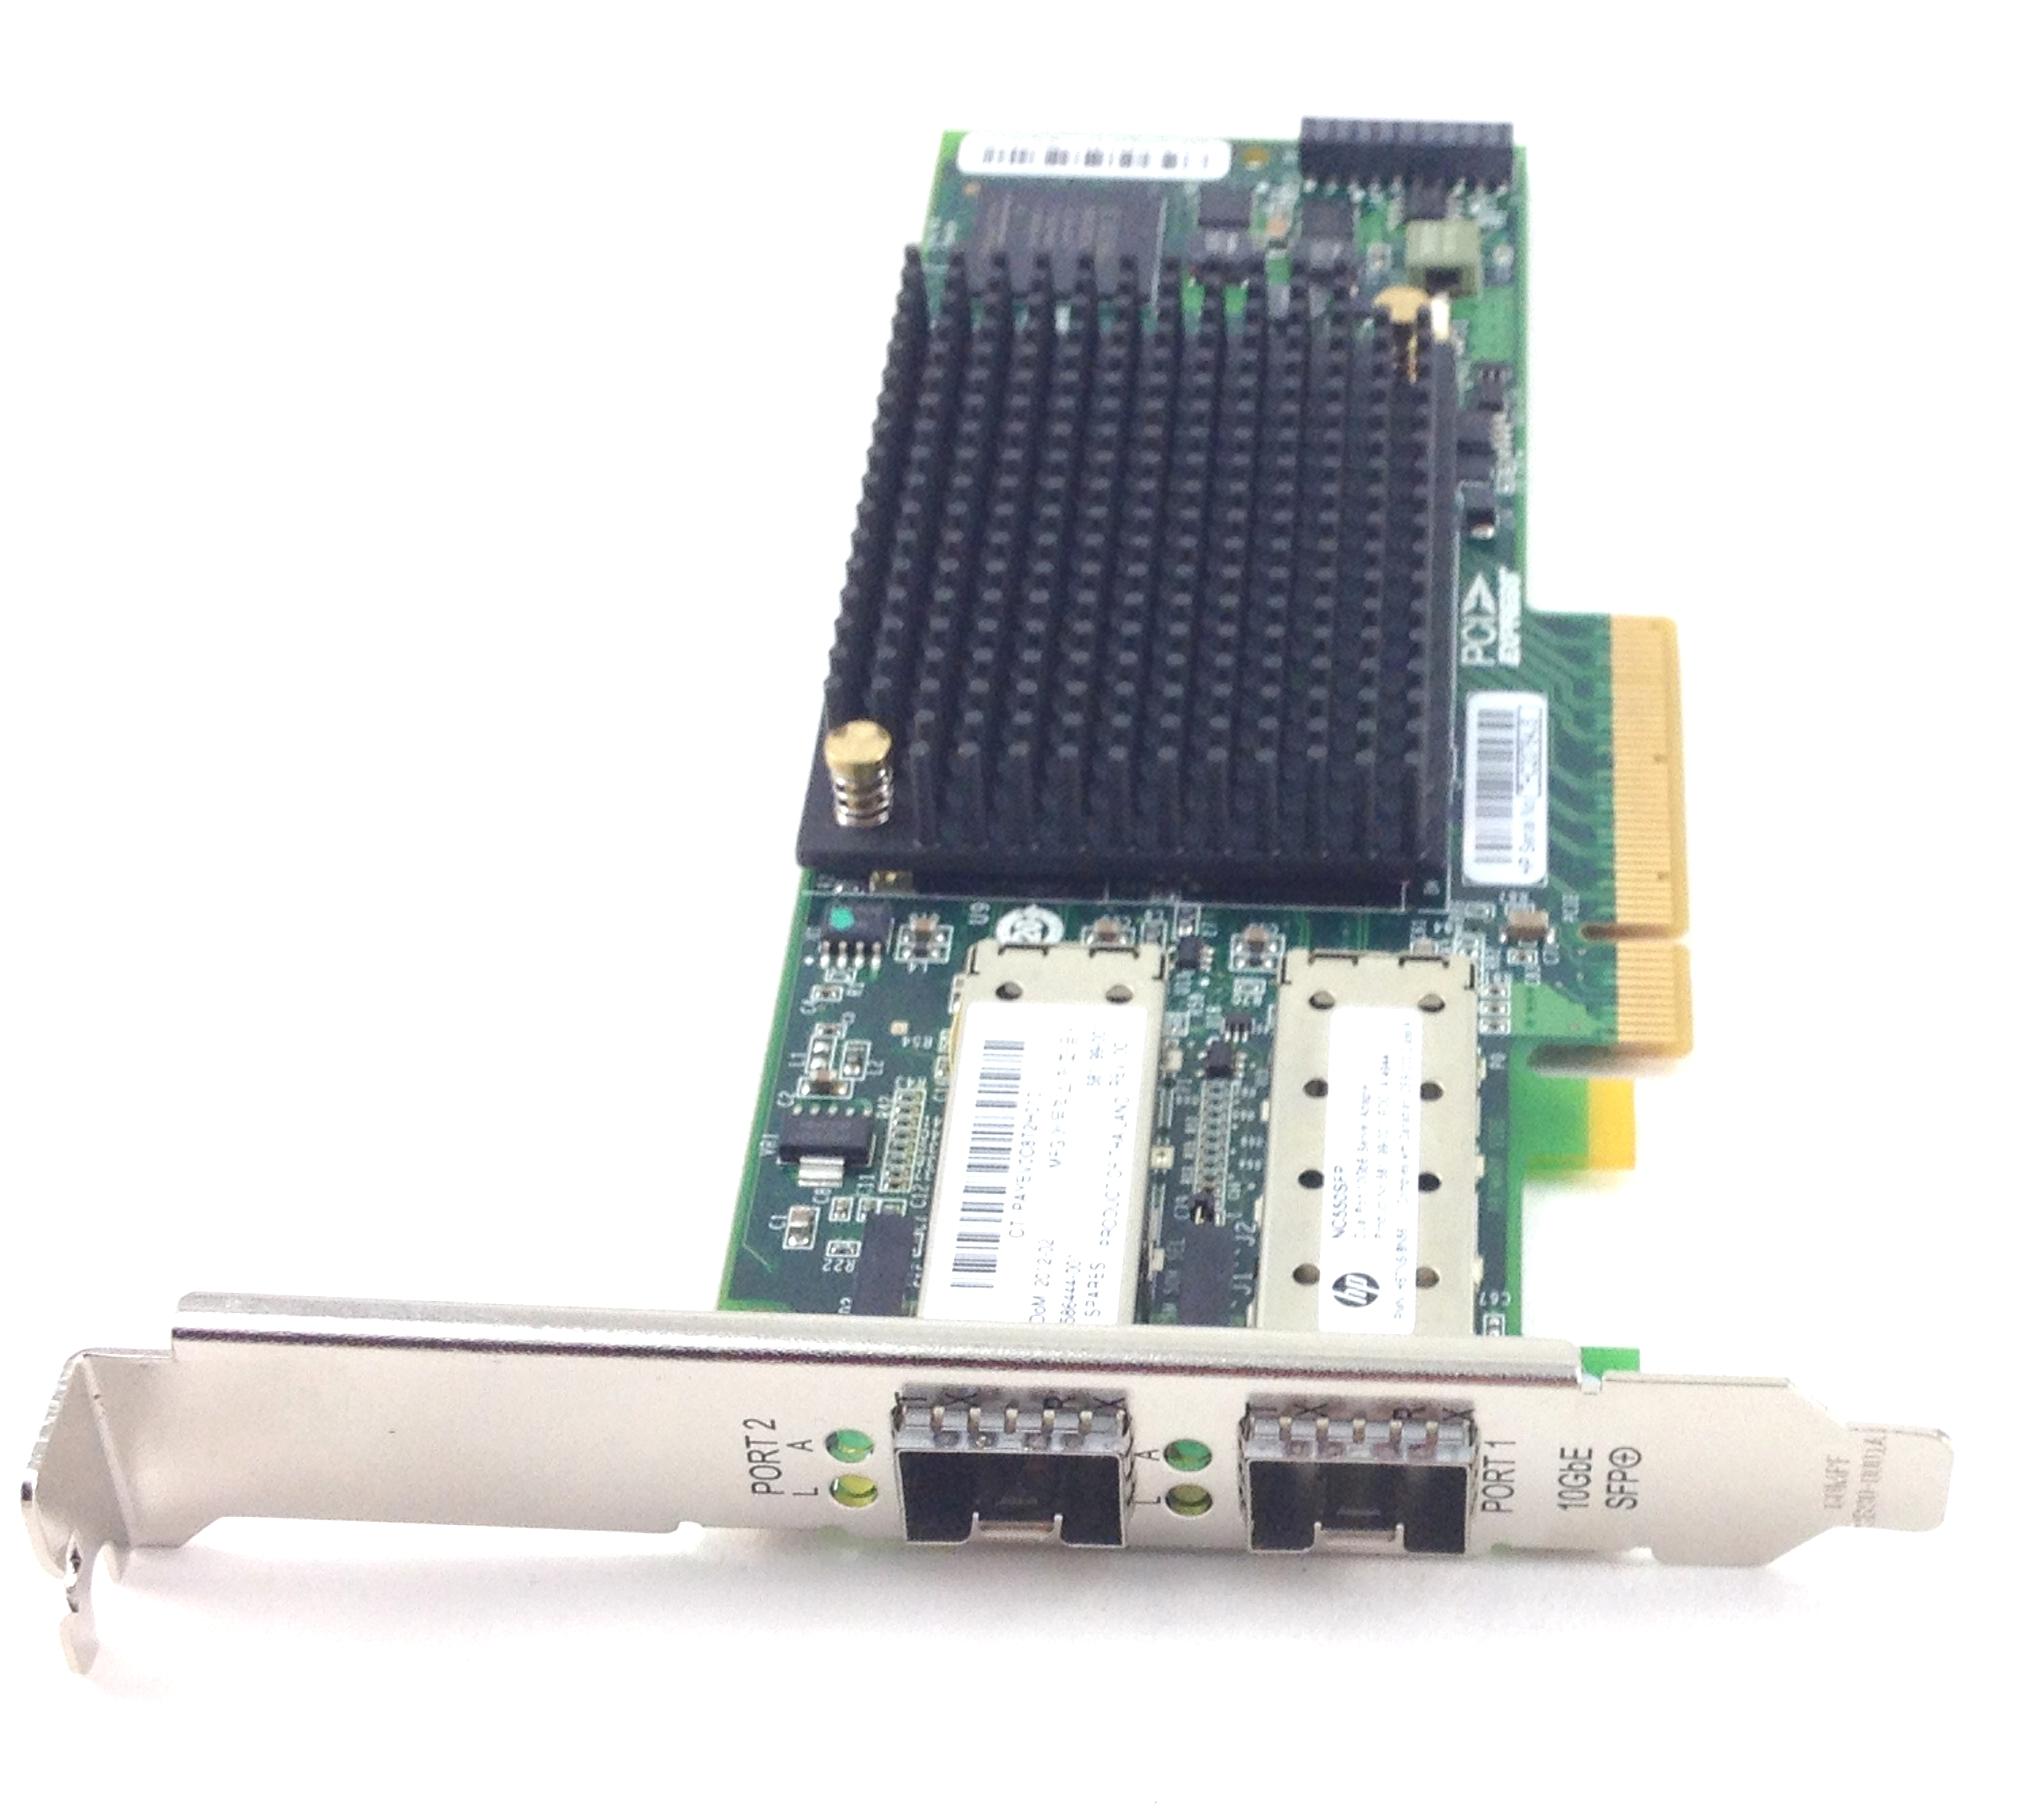 DUAL PORT 10GBE PCI-E 2.0 SERVER ADAPTER (586444-001)